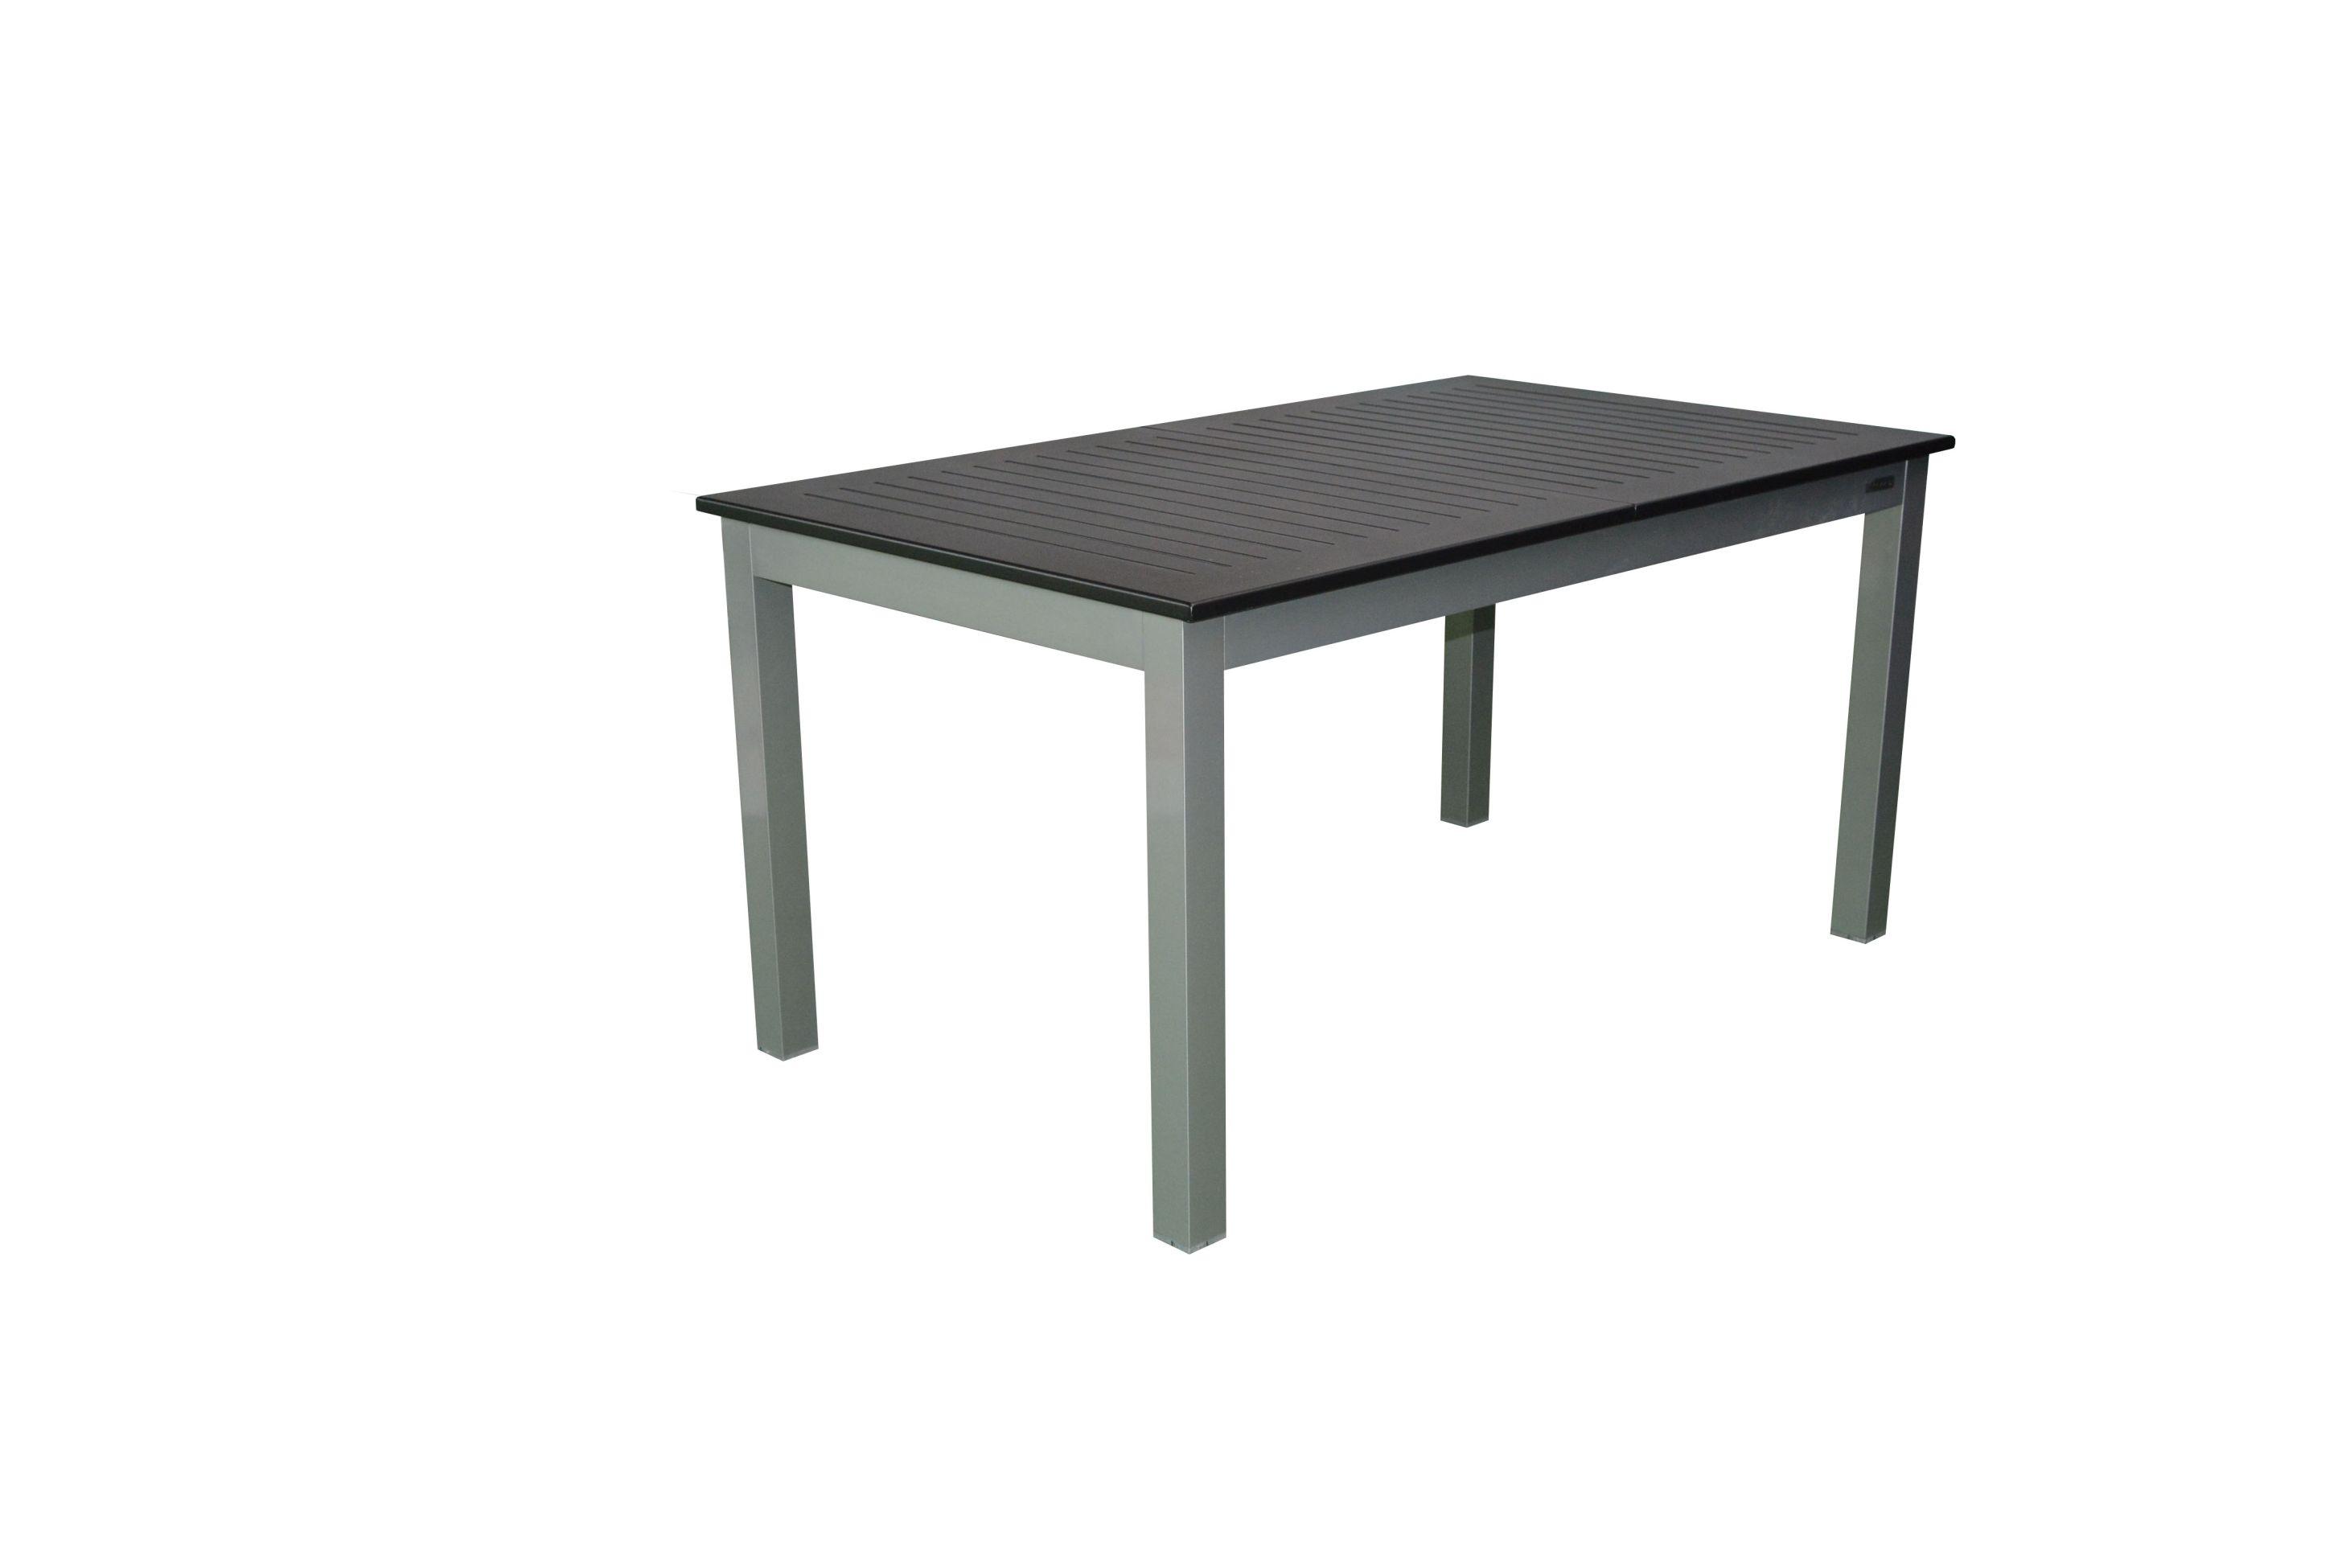 palu alu gartenm bel set sitzgarnitur 11tlg silber schwarz gartenm bel gruppen garten. Black Bedroom Furniture Sets. Home Design Ideas